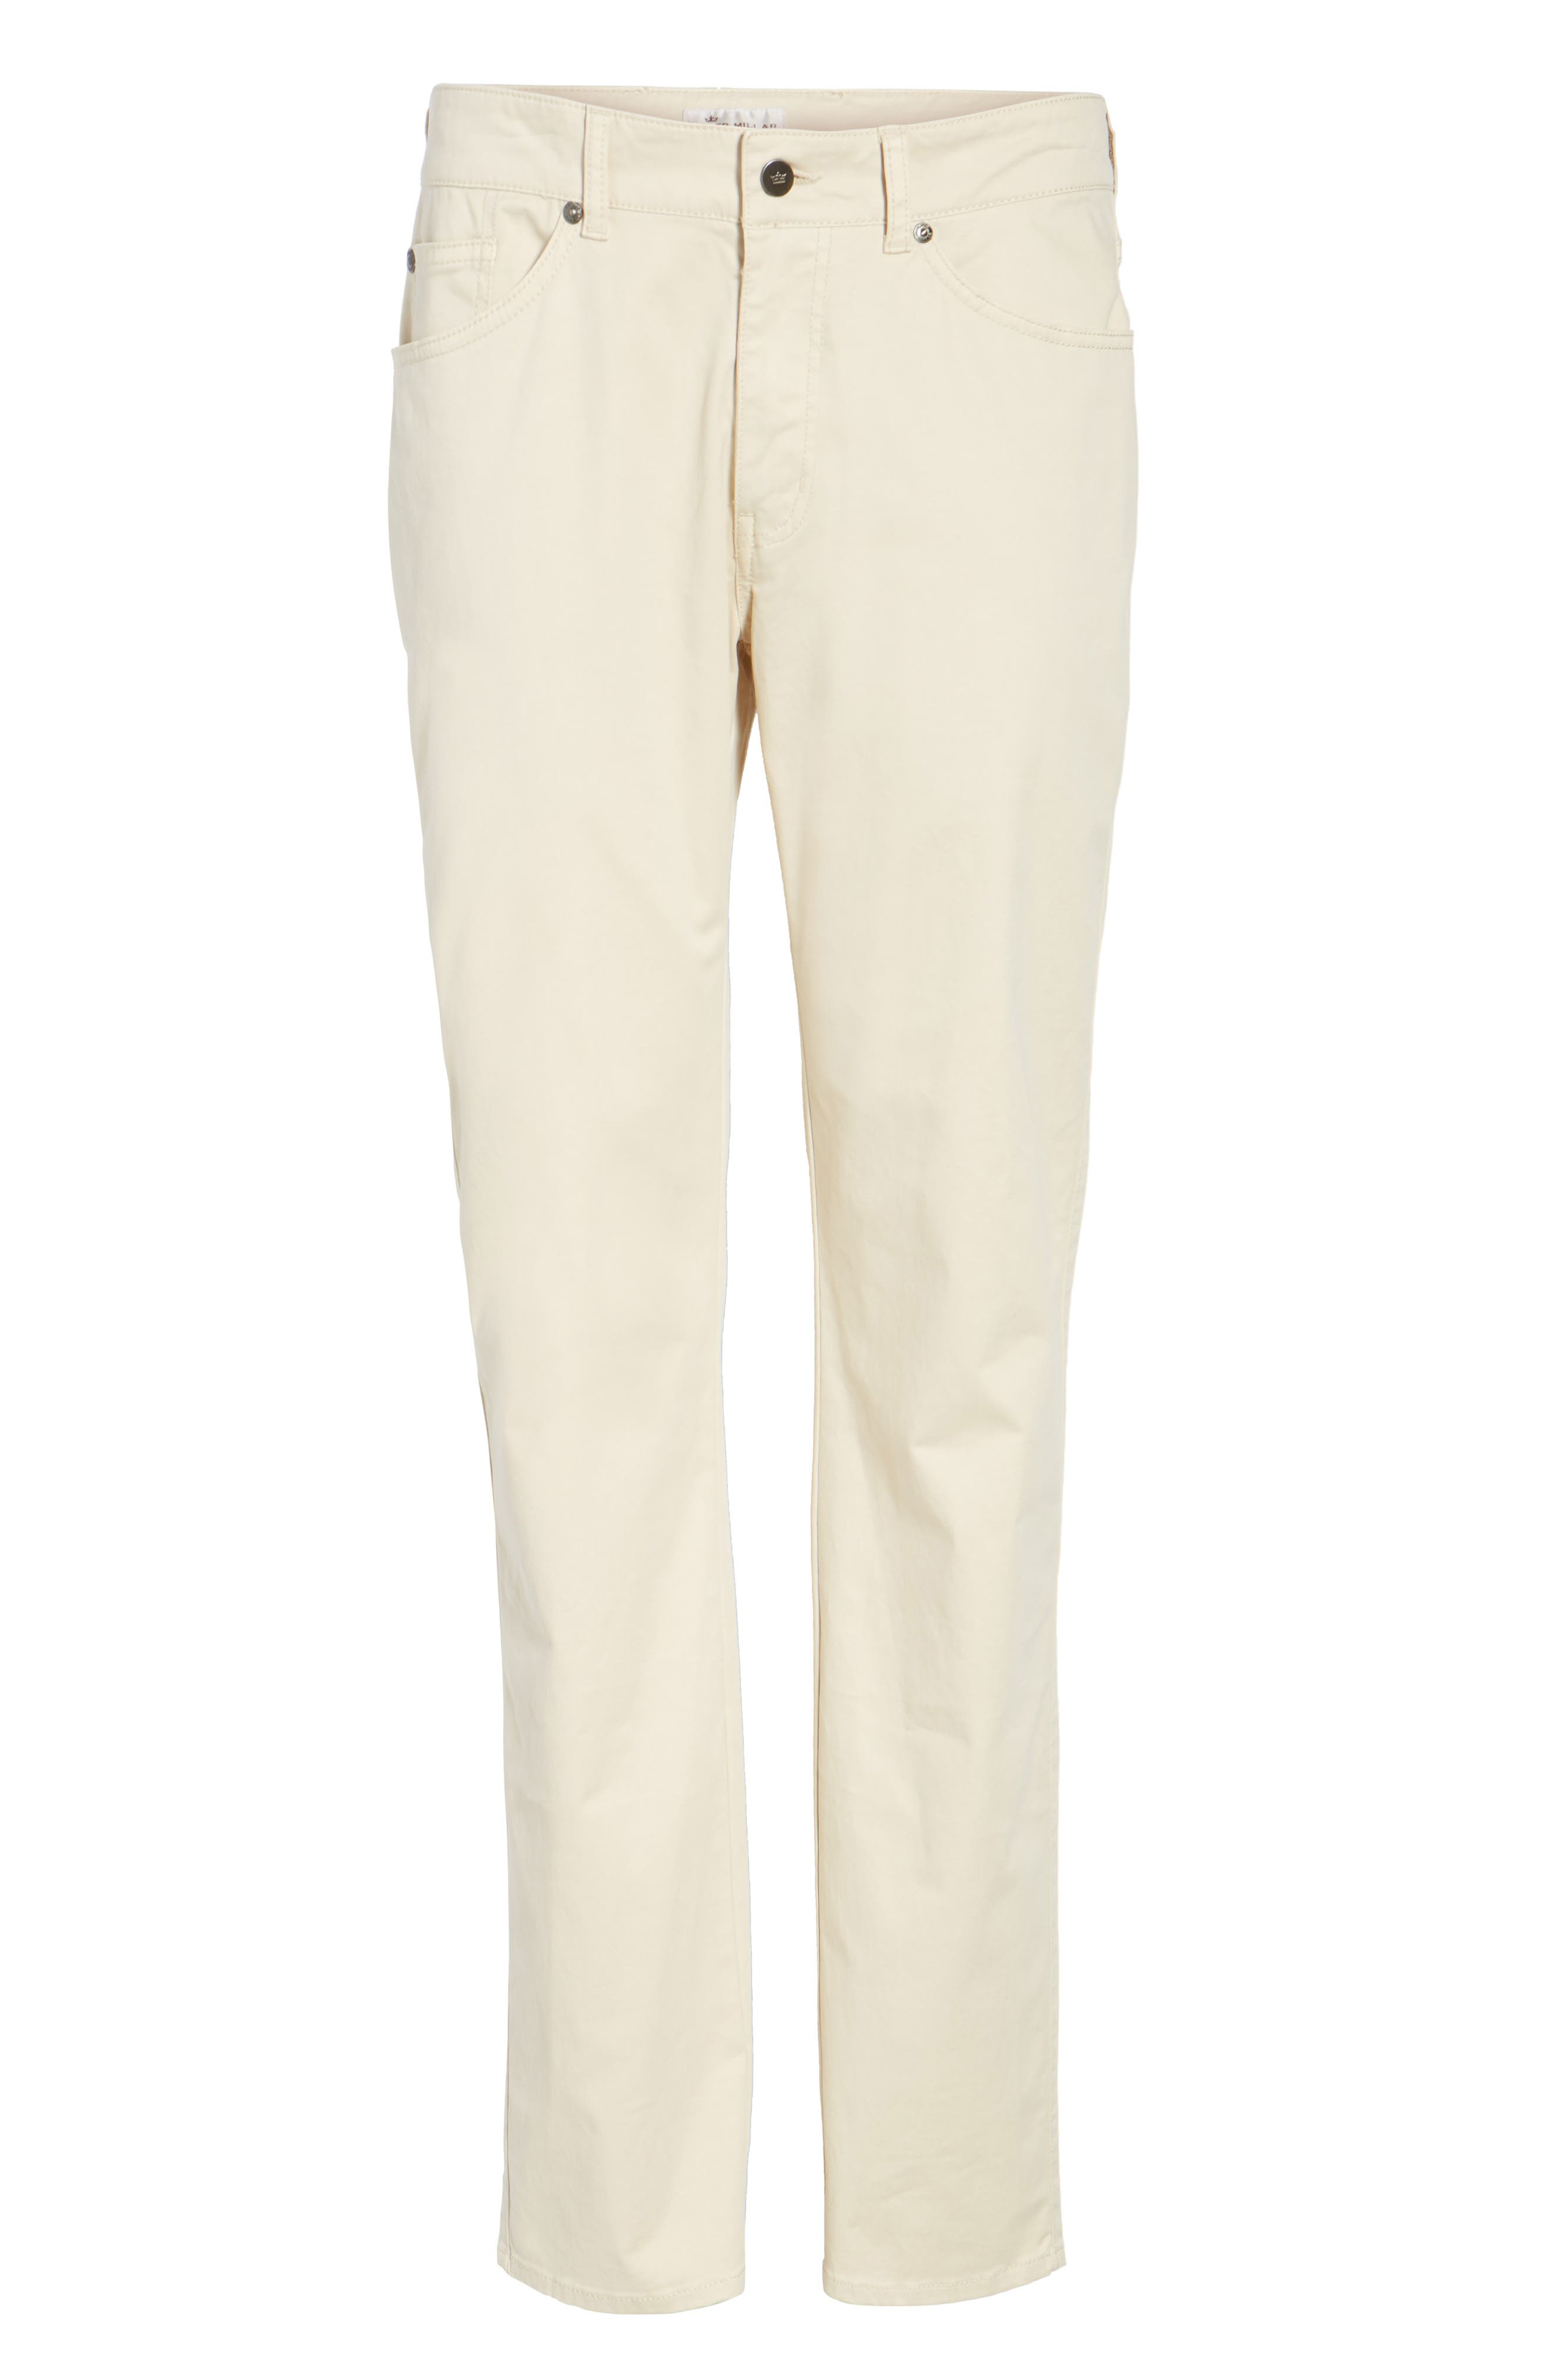 Stretch Sateen Five-Pocket Pants,                             Alternate thumbnail 6, color,                             Light Sand